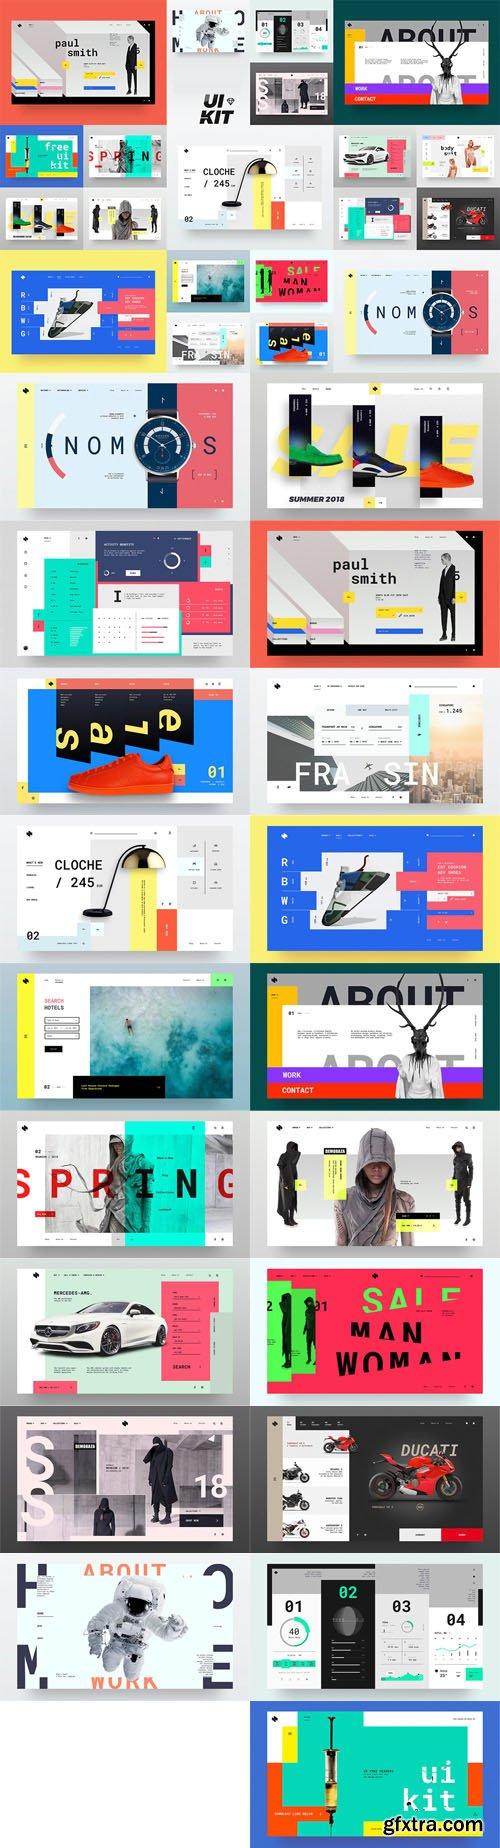 HeaderZ UI Kit Design SKETCH Templates